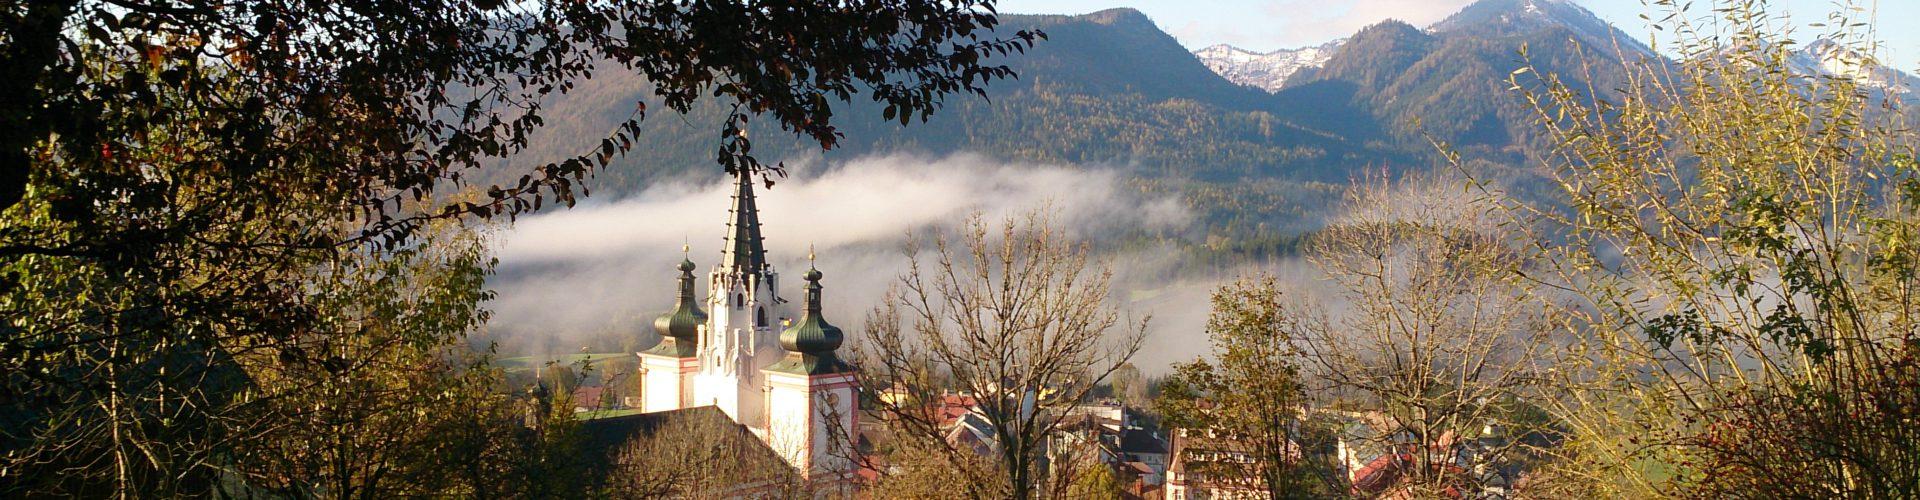 Kreuzwegstation Mariazell